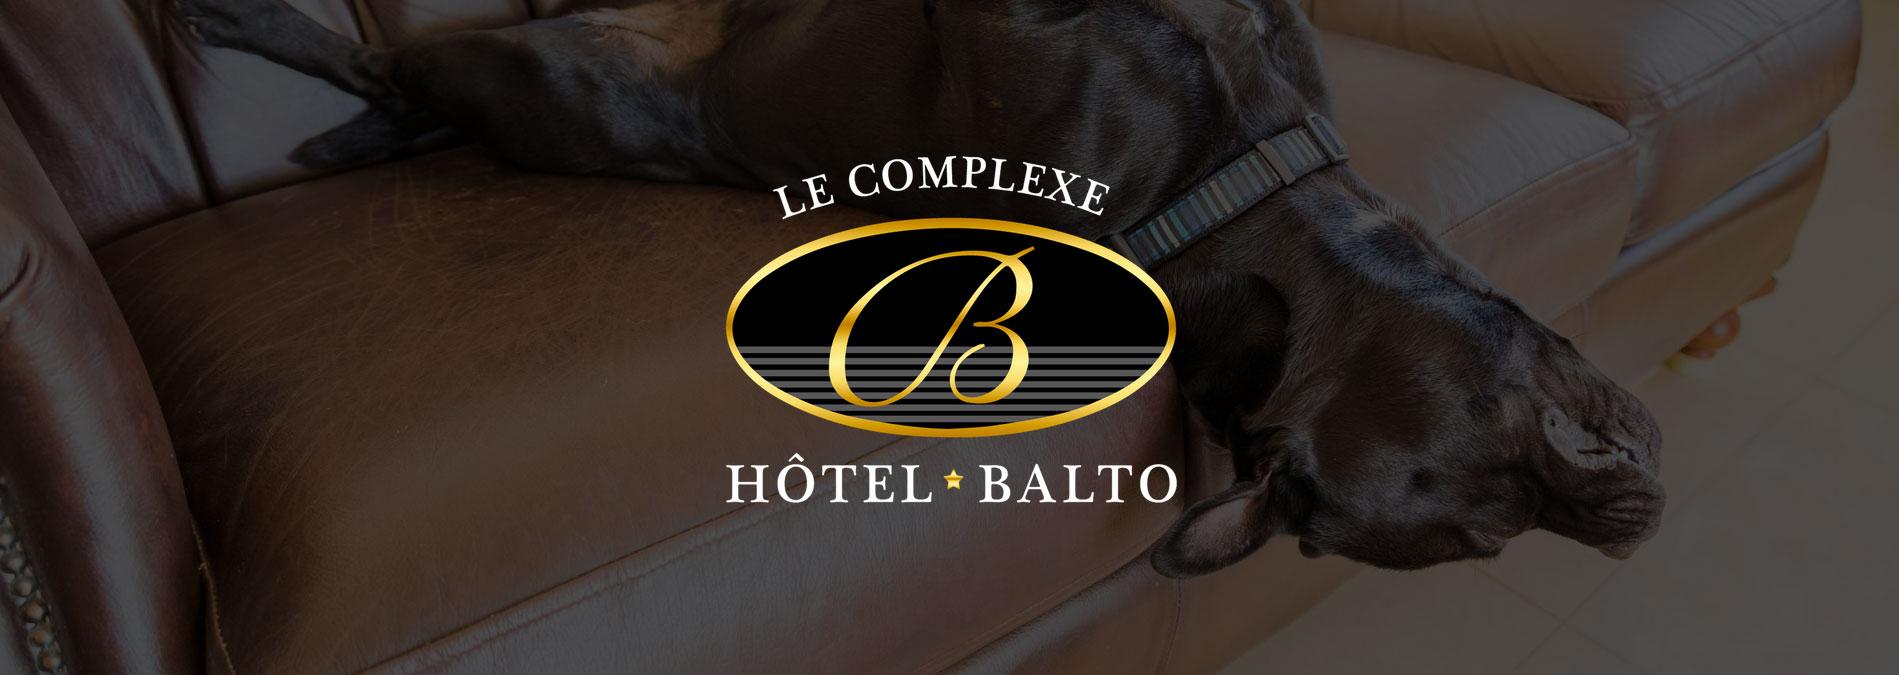 Hotel-Balto pension pour animaux